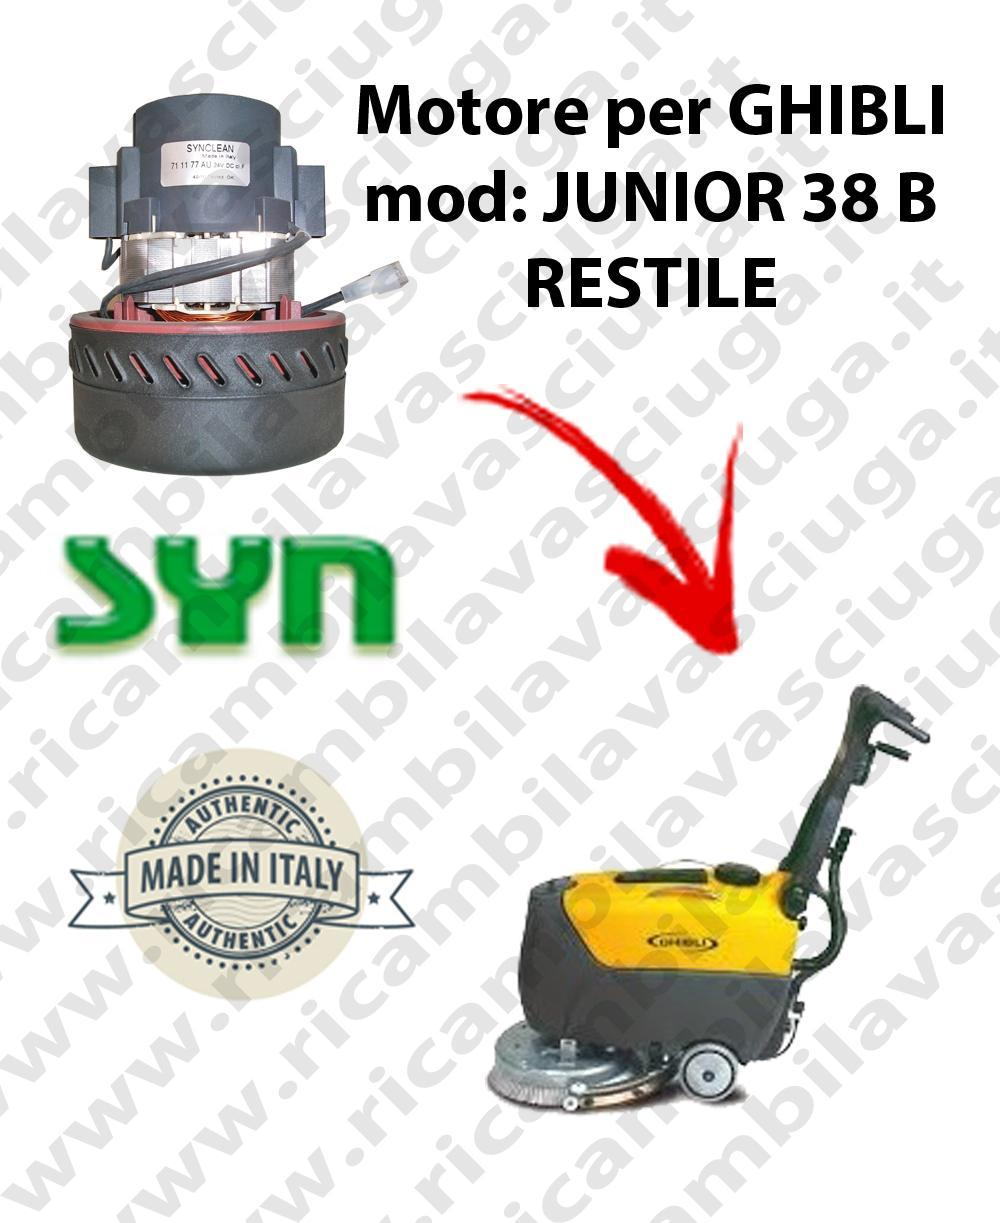 JUNIOR 38 B RESTILE Vacuum motor SY NCLEAN for scrubber dryer GHIBLI